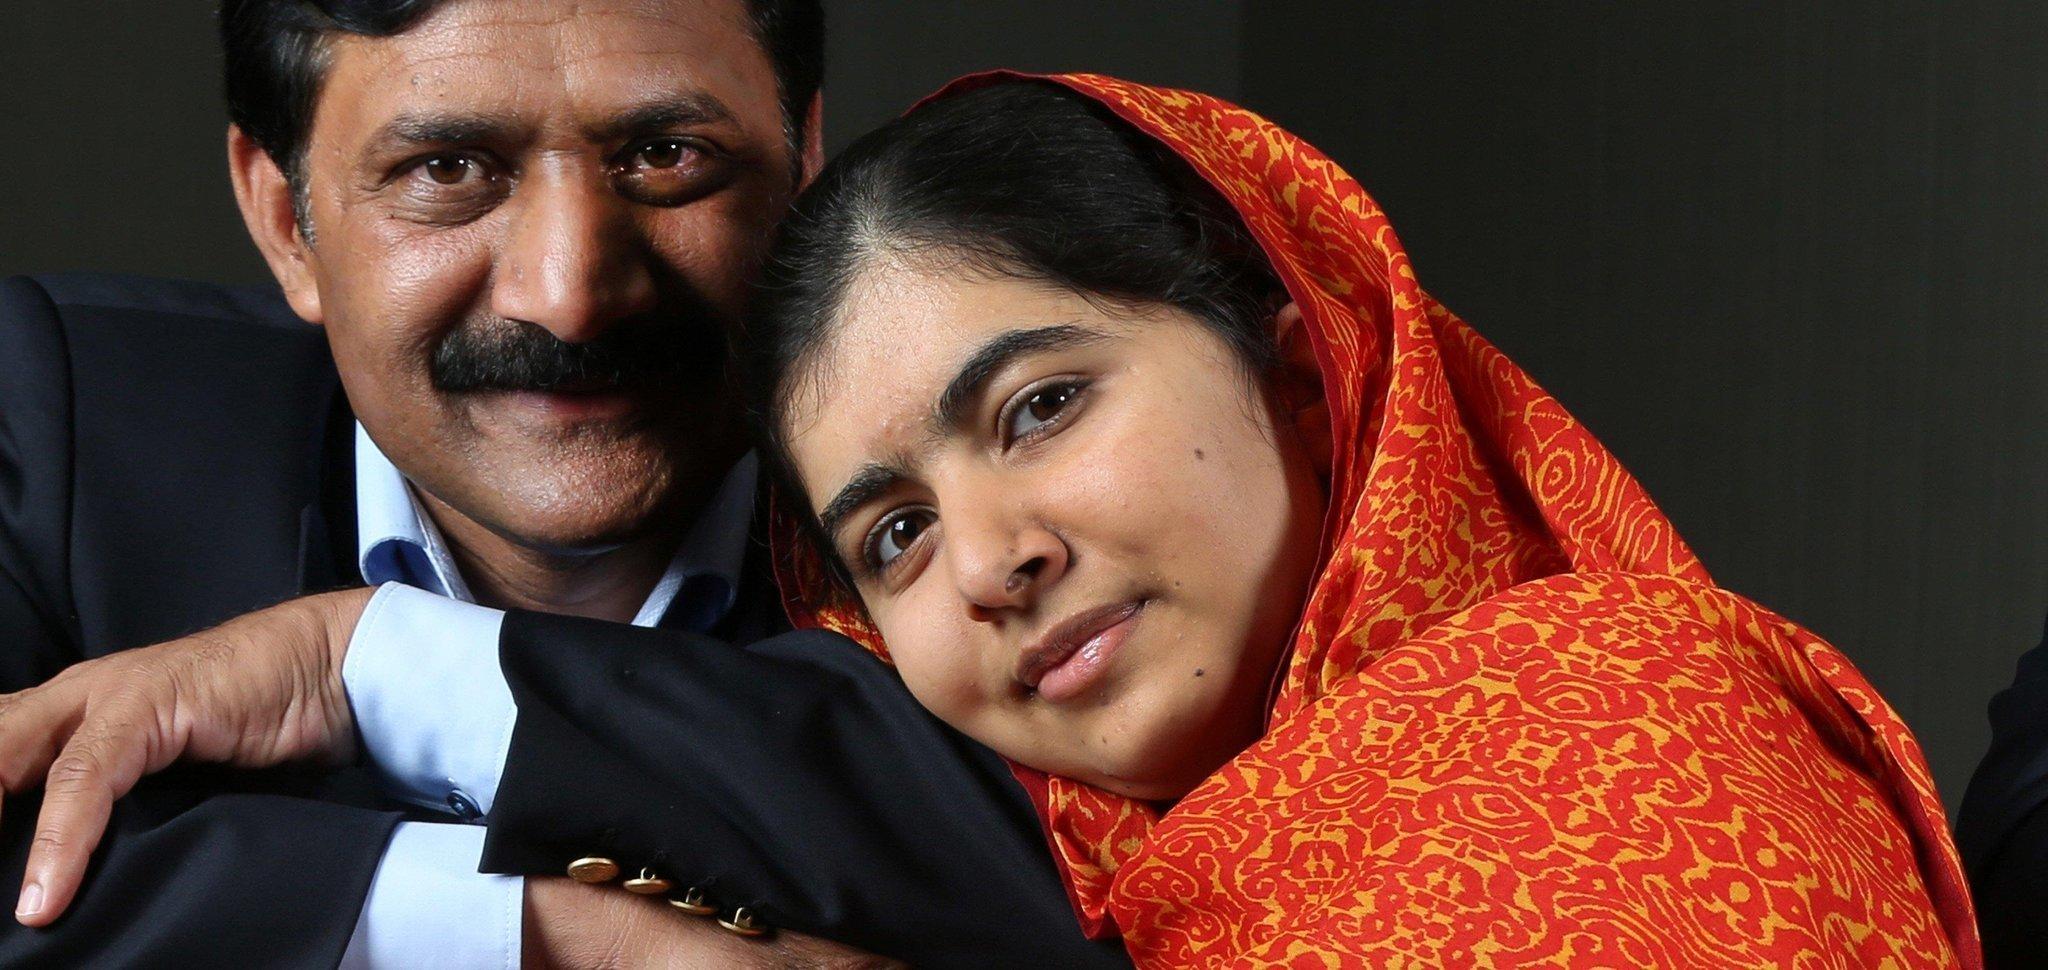 malala yuosafai Malala yousafzai biografía resumida activista pakistaní premios: premio nobel de la paz, premio sájarov, premio simone de beauvoir nombre: malala makai nació.